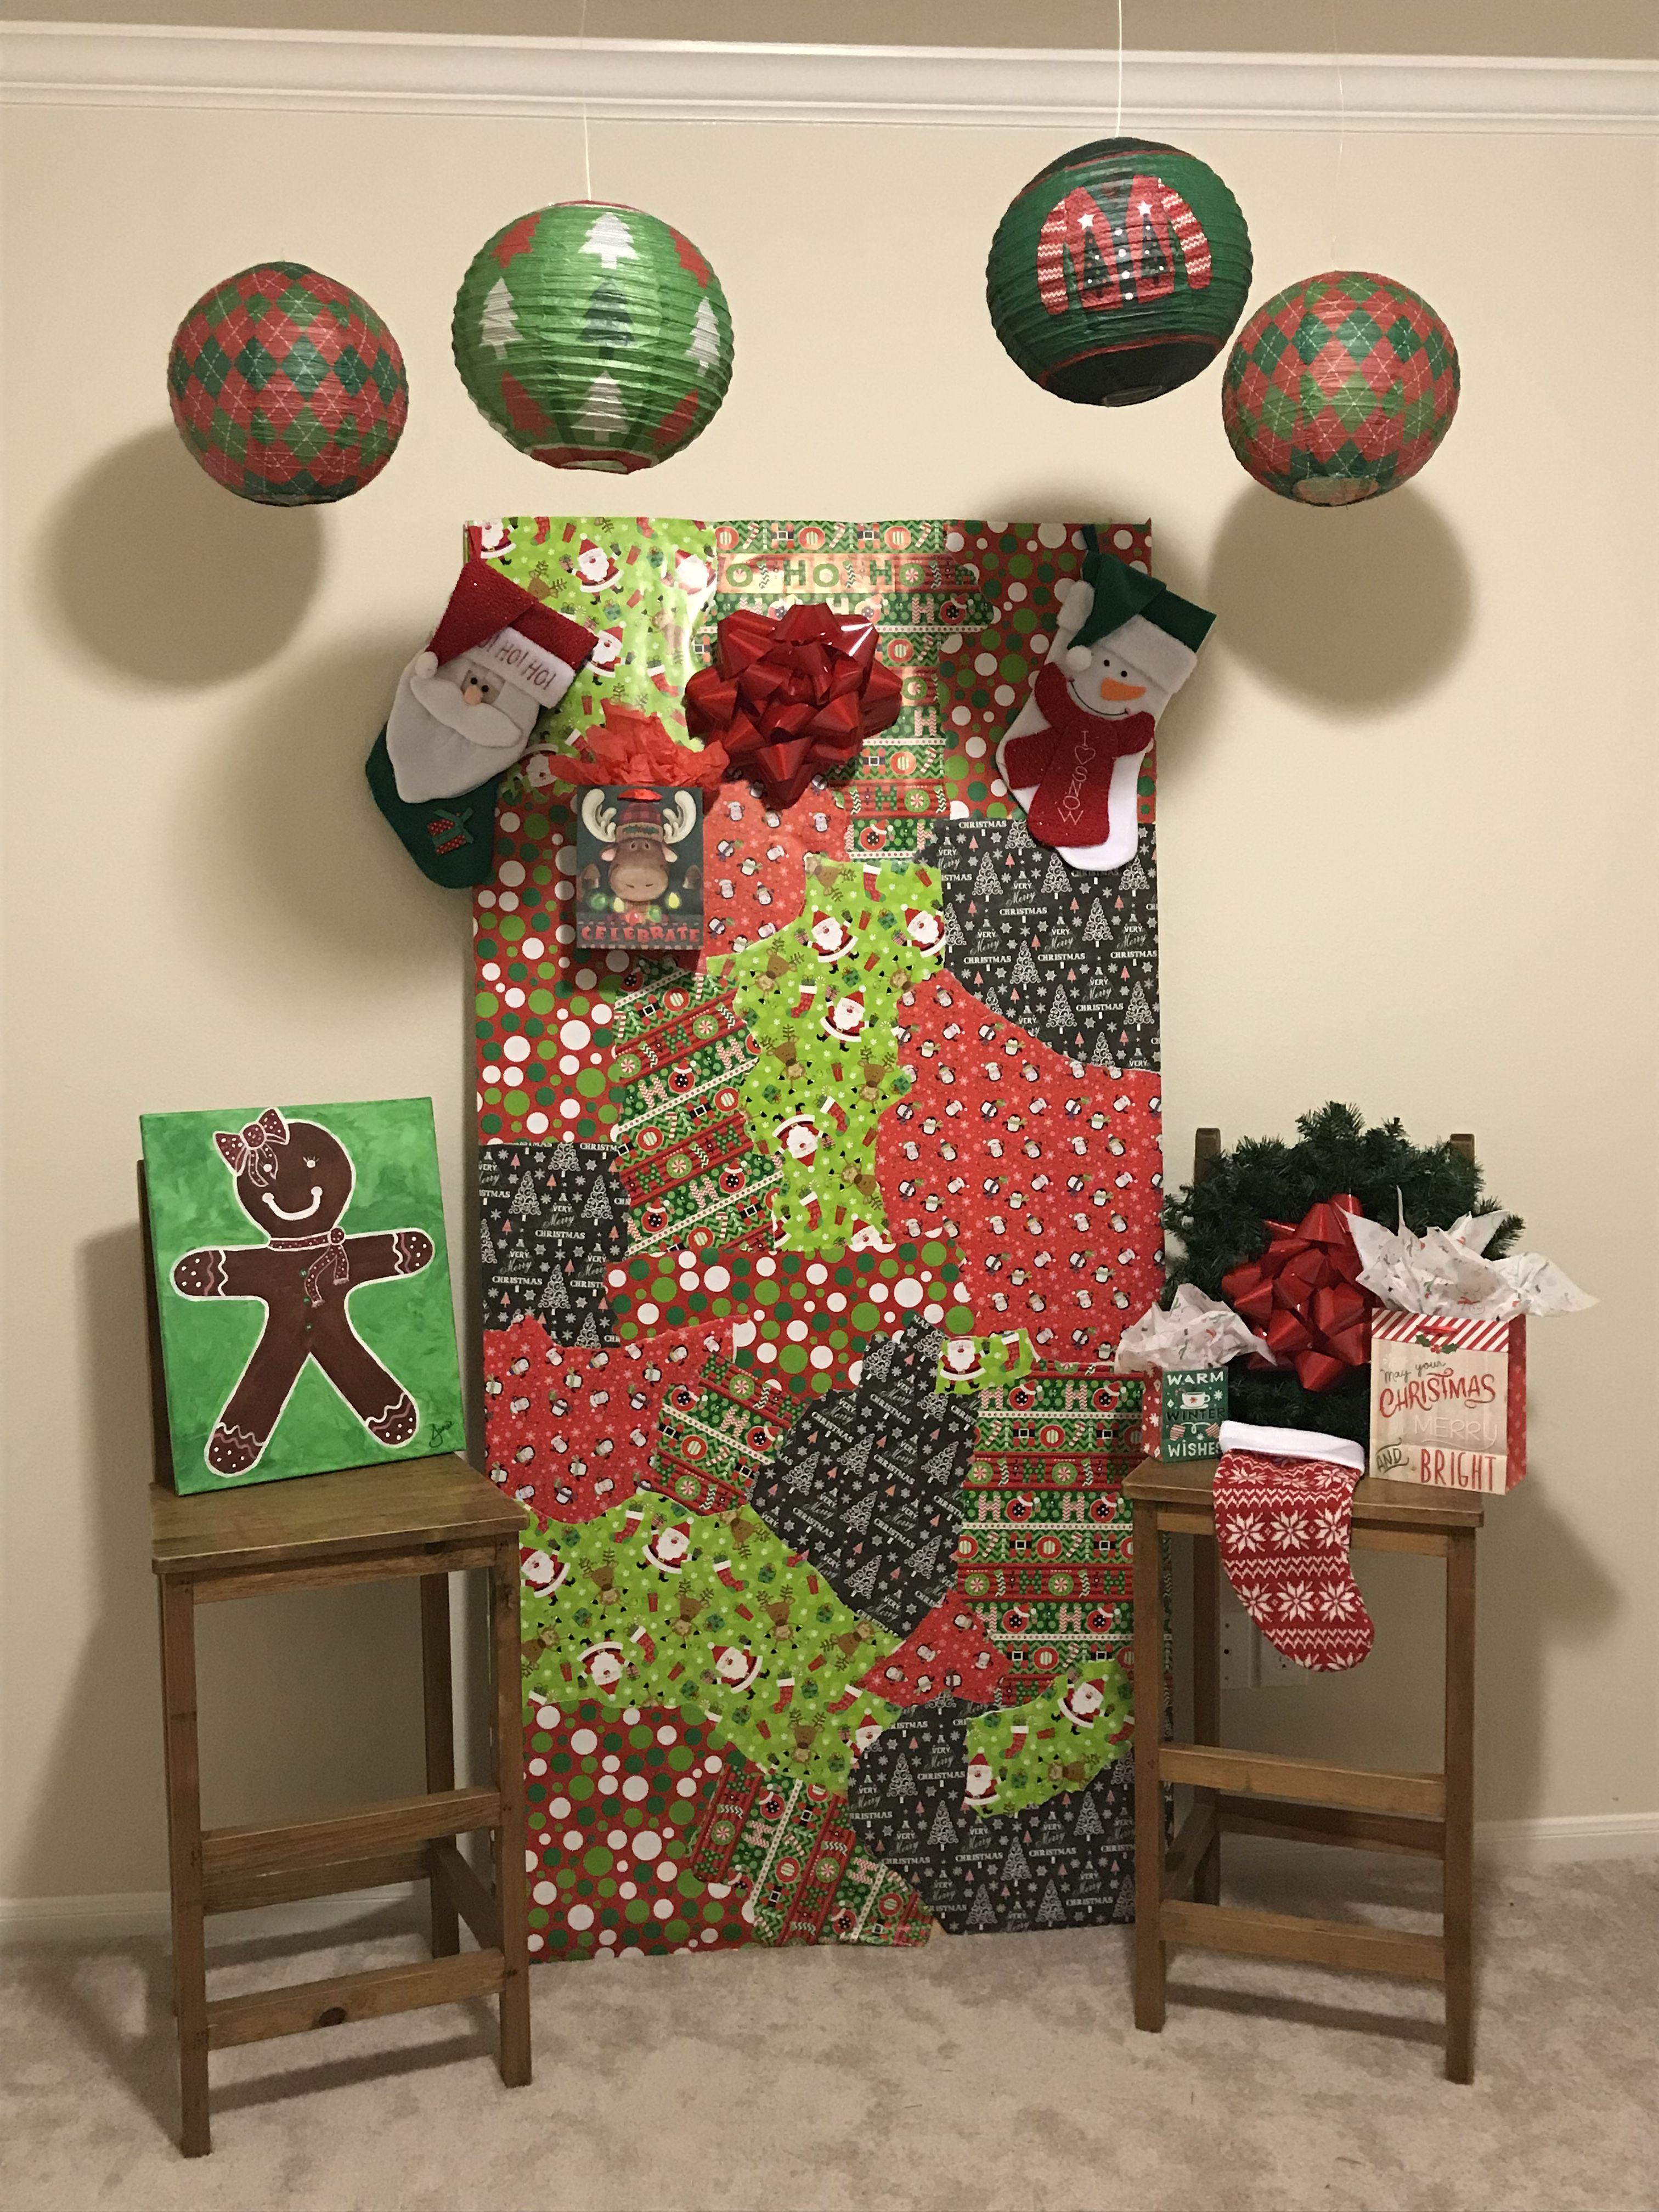 Elf Christmas Treewhite Christmas Tree Decorationssanta Decorationsthemed Christmas Treesdecorated Christmas